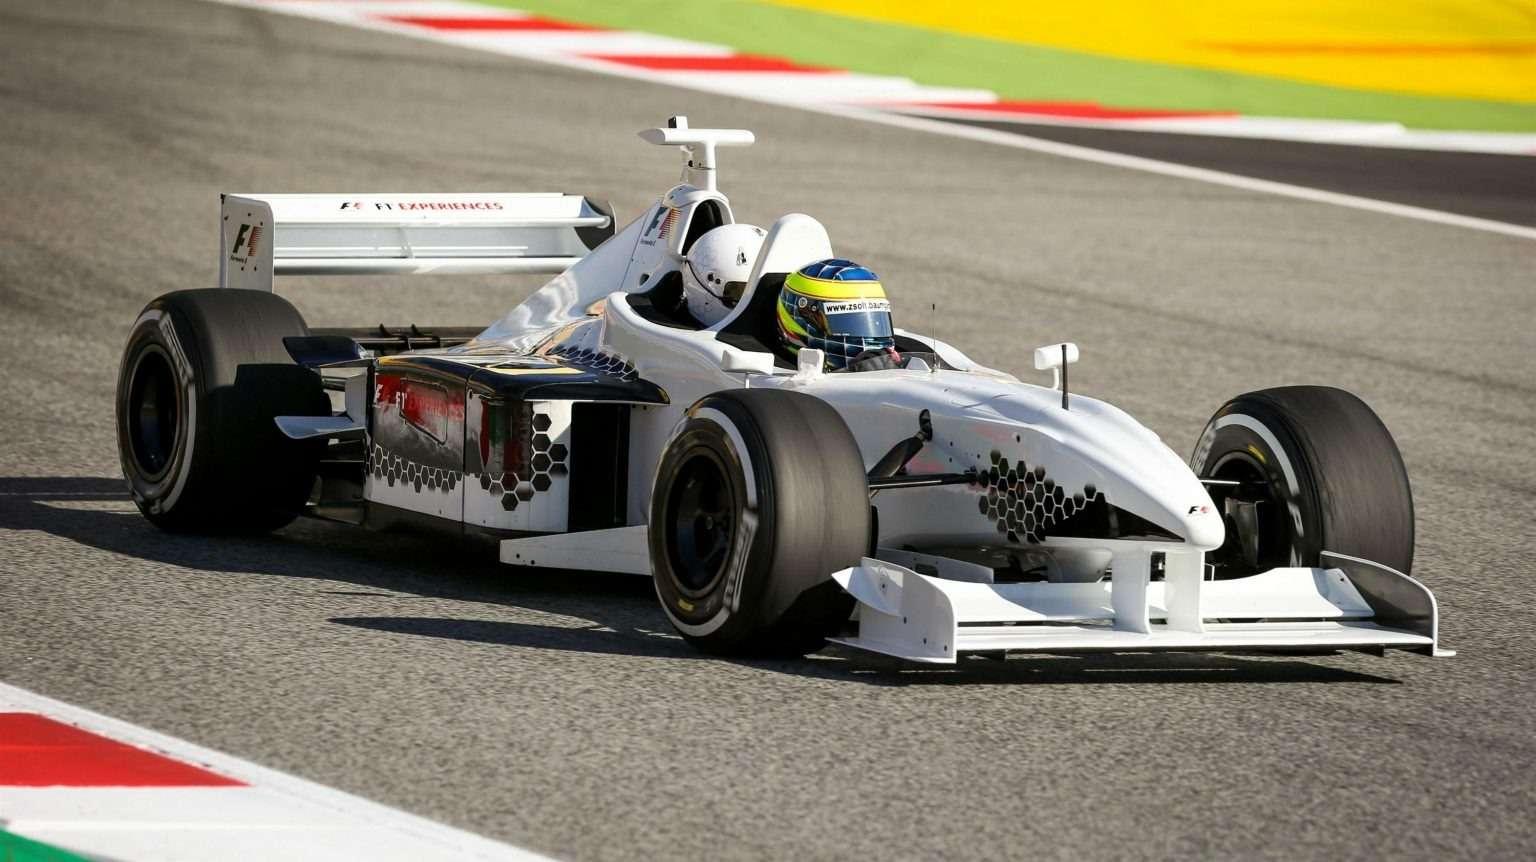 Формула 1, Гран-При Испании, Даниил Квят, Фернандо Алонсо, Льюис Хэмилтон, Себастьян Феттель